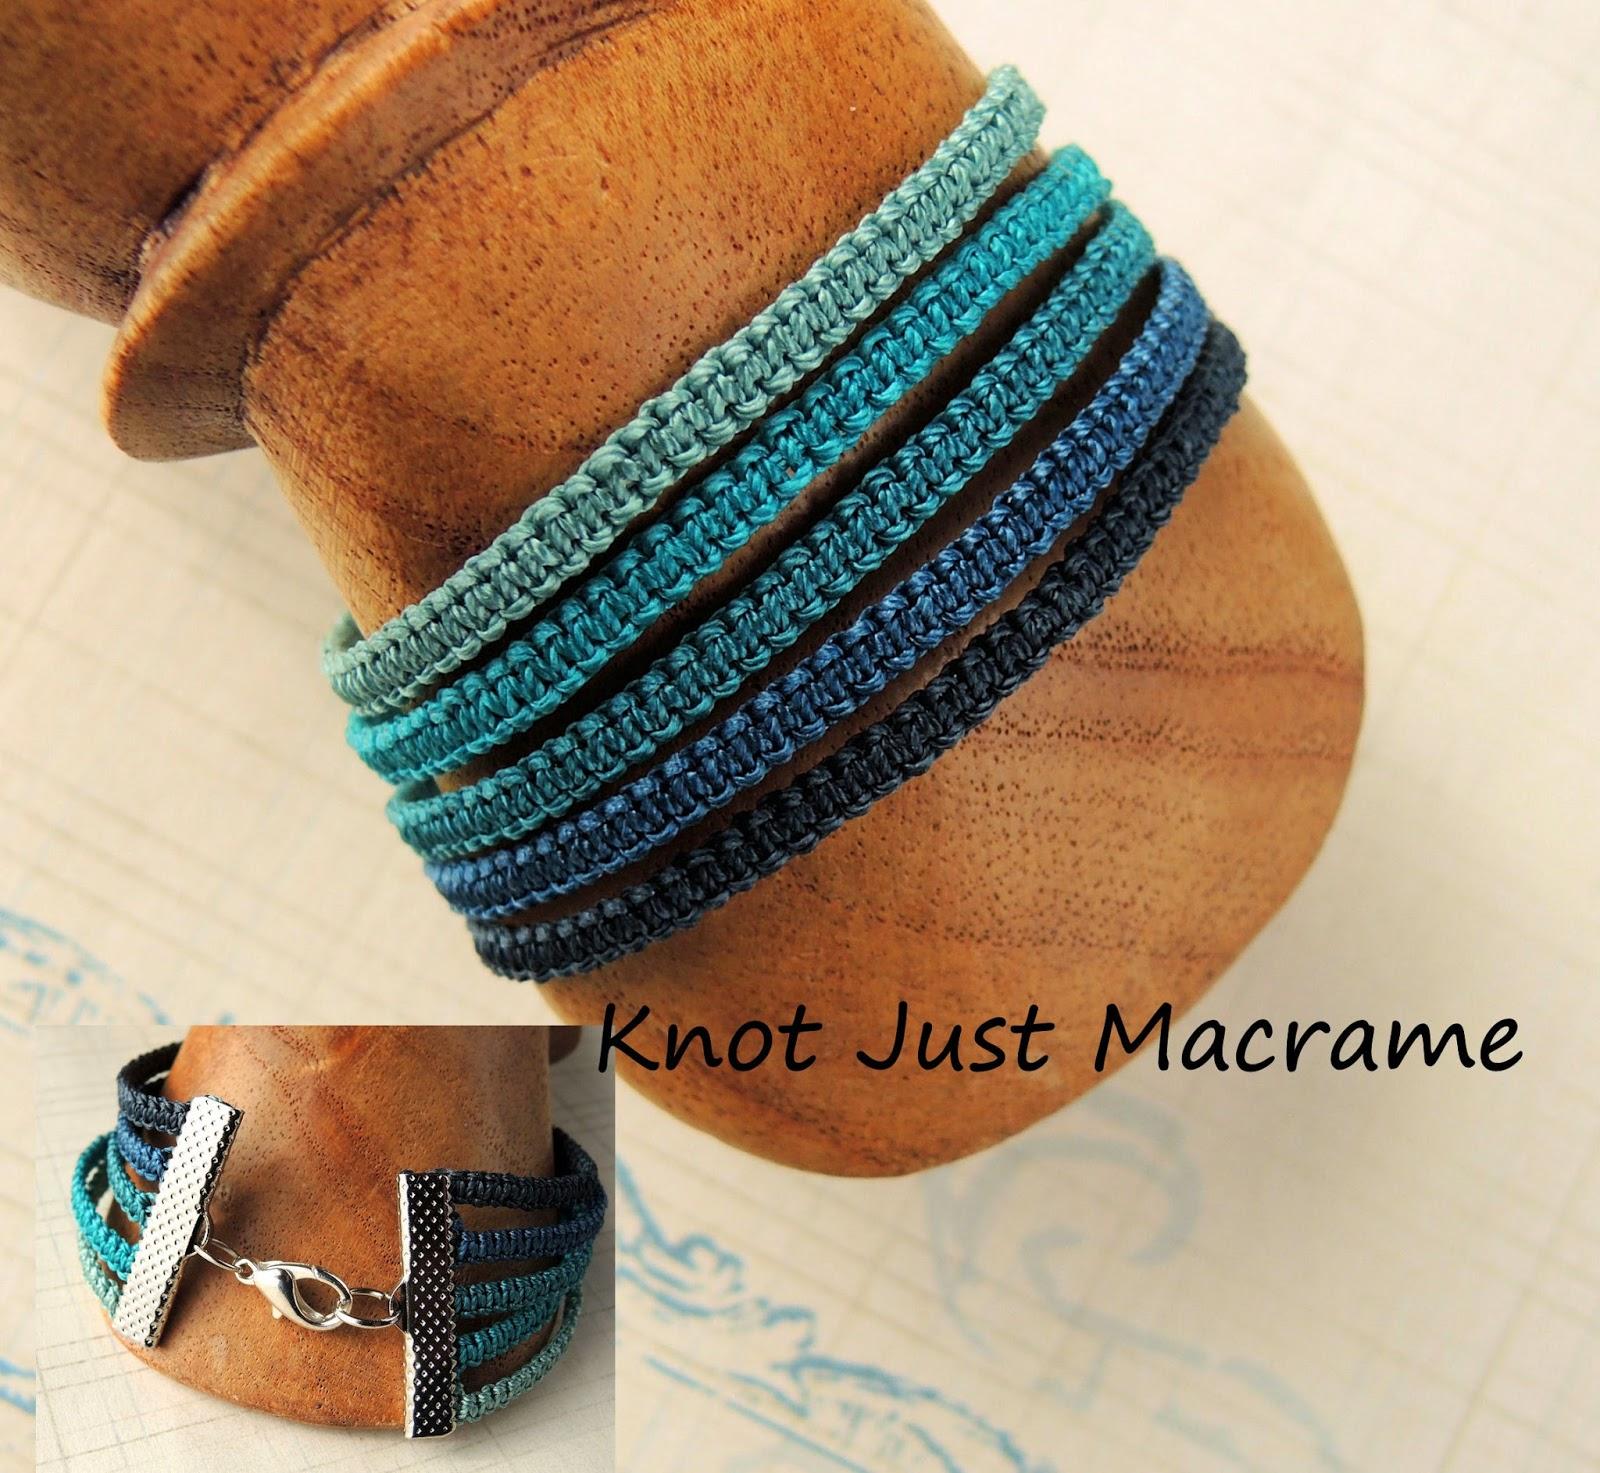 Micro Macrame Stack Bracelet by Sherri Stokey of Knot Just Macrame